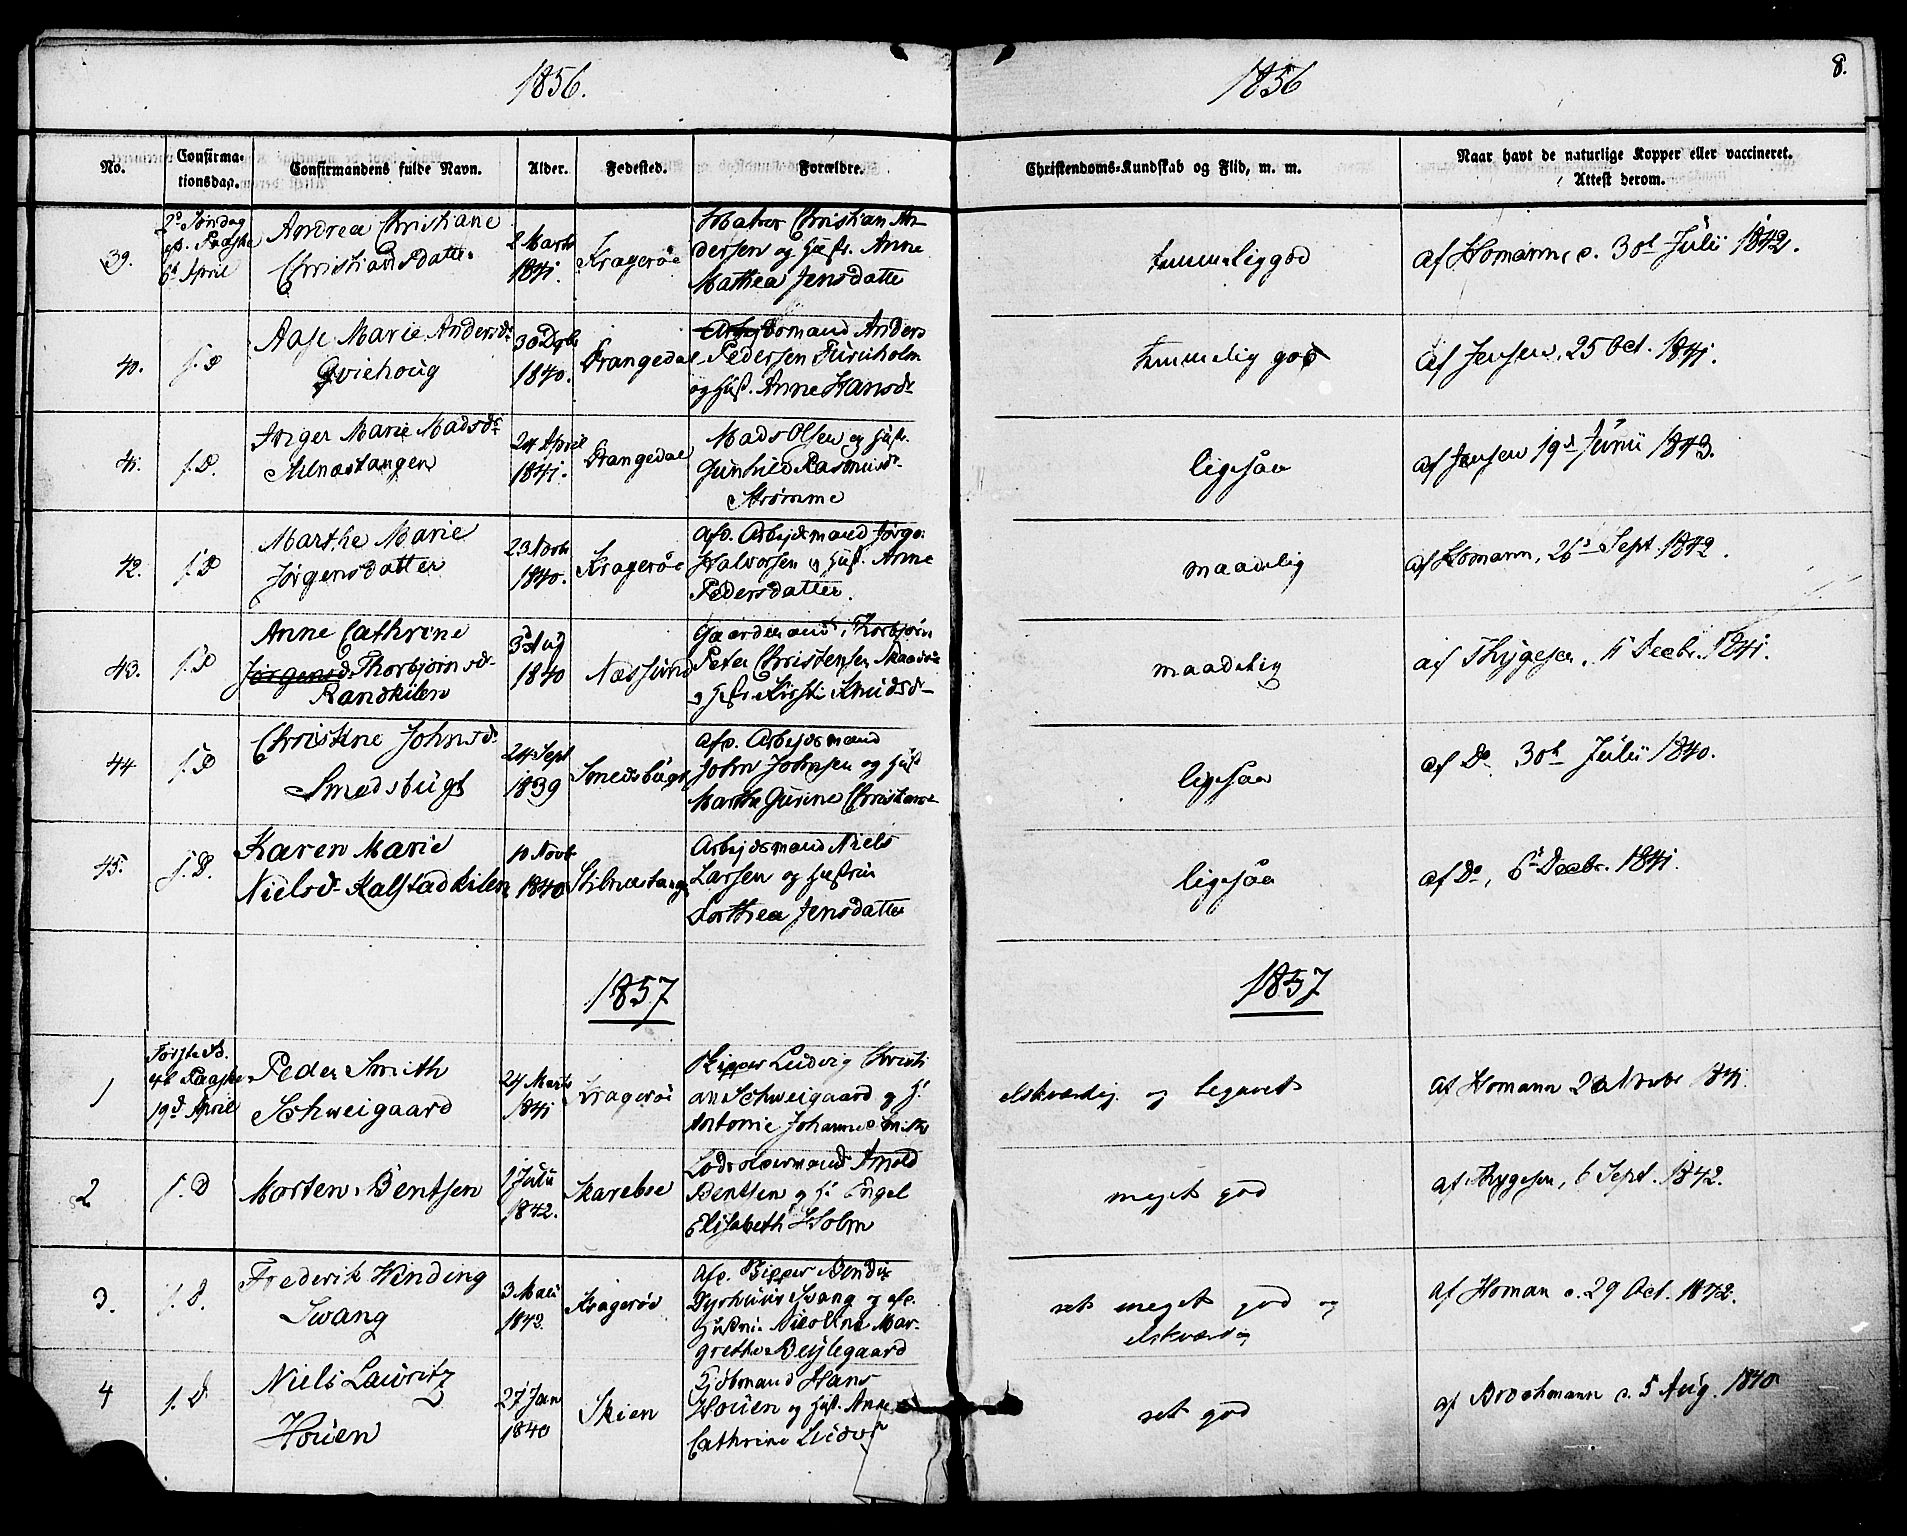 SAKO, Kragerø kirkebøker, F/Fa/L0008: Ministerialbok nr. 8, 1856-1880, s. 8